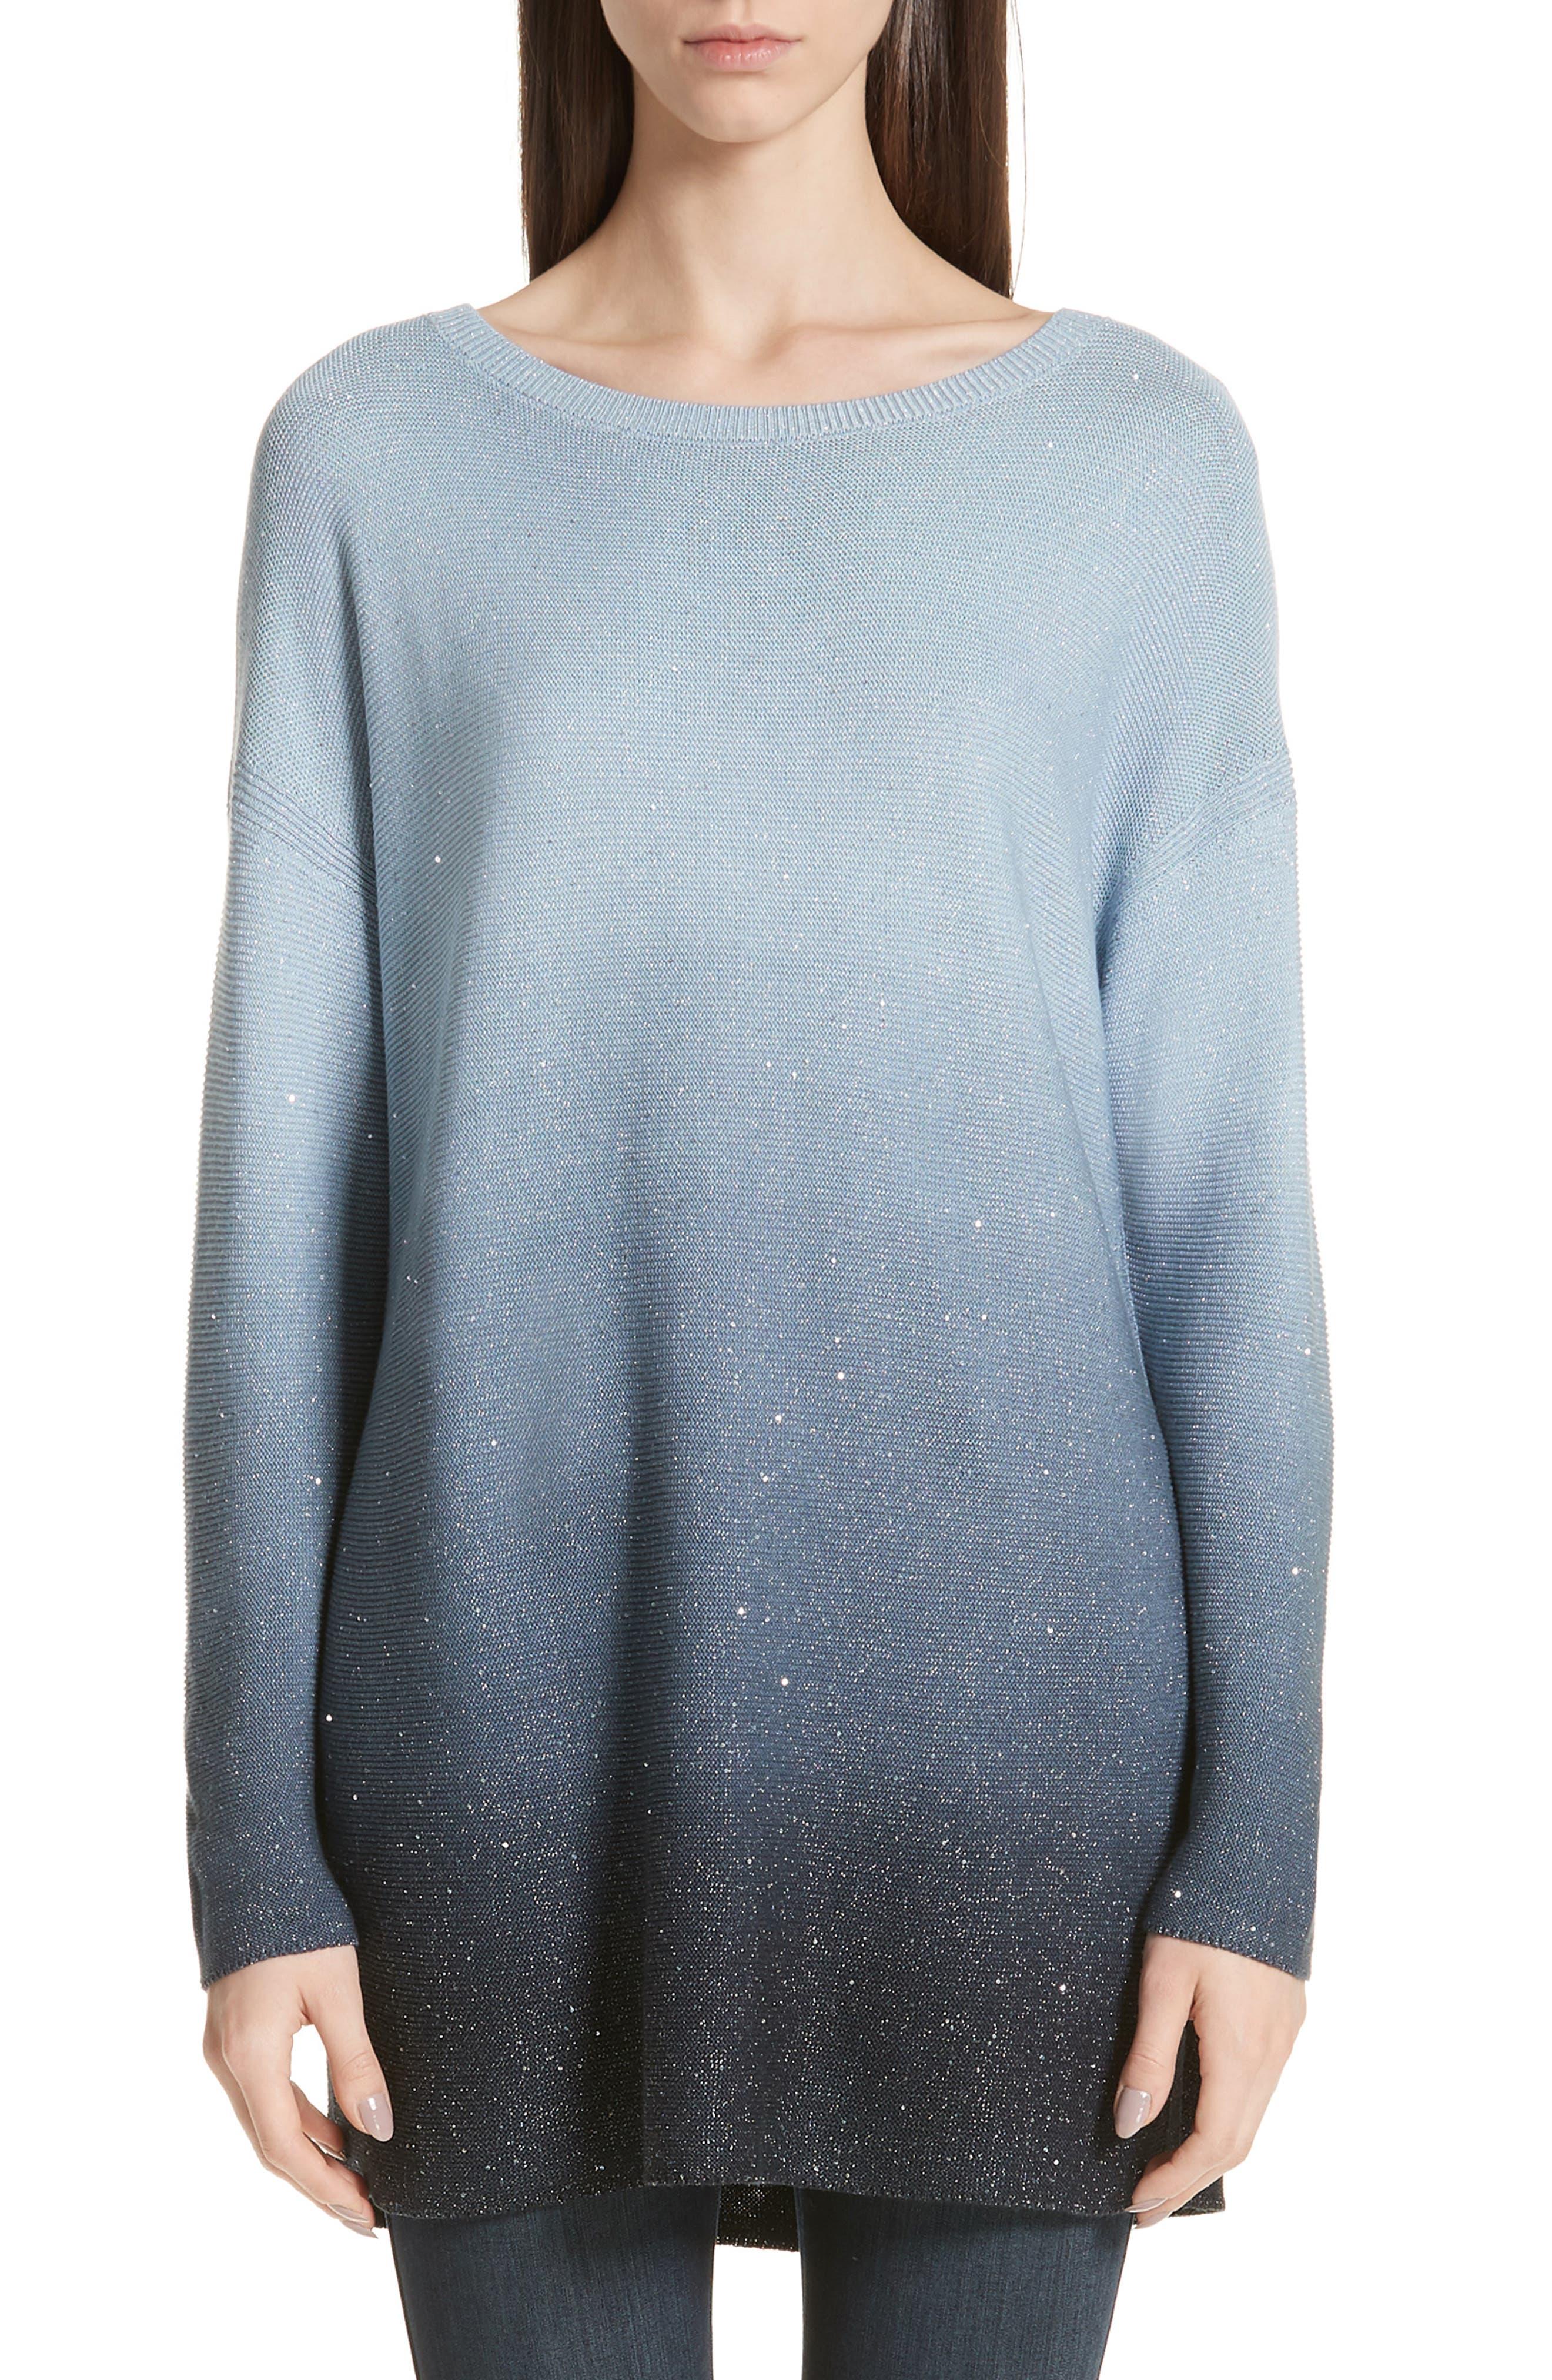 LAFAYETTE 148 NEW YORK Sequin Ombré Silk Blend Tunic, Main, color, SLATE BLUE MULTI